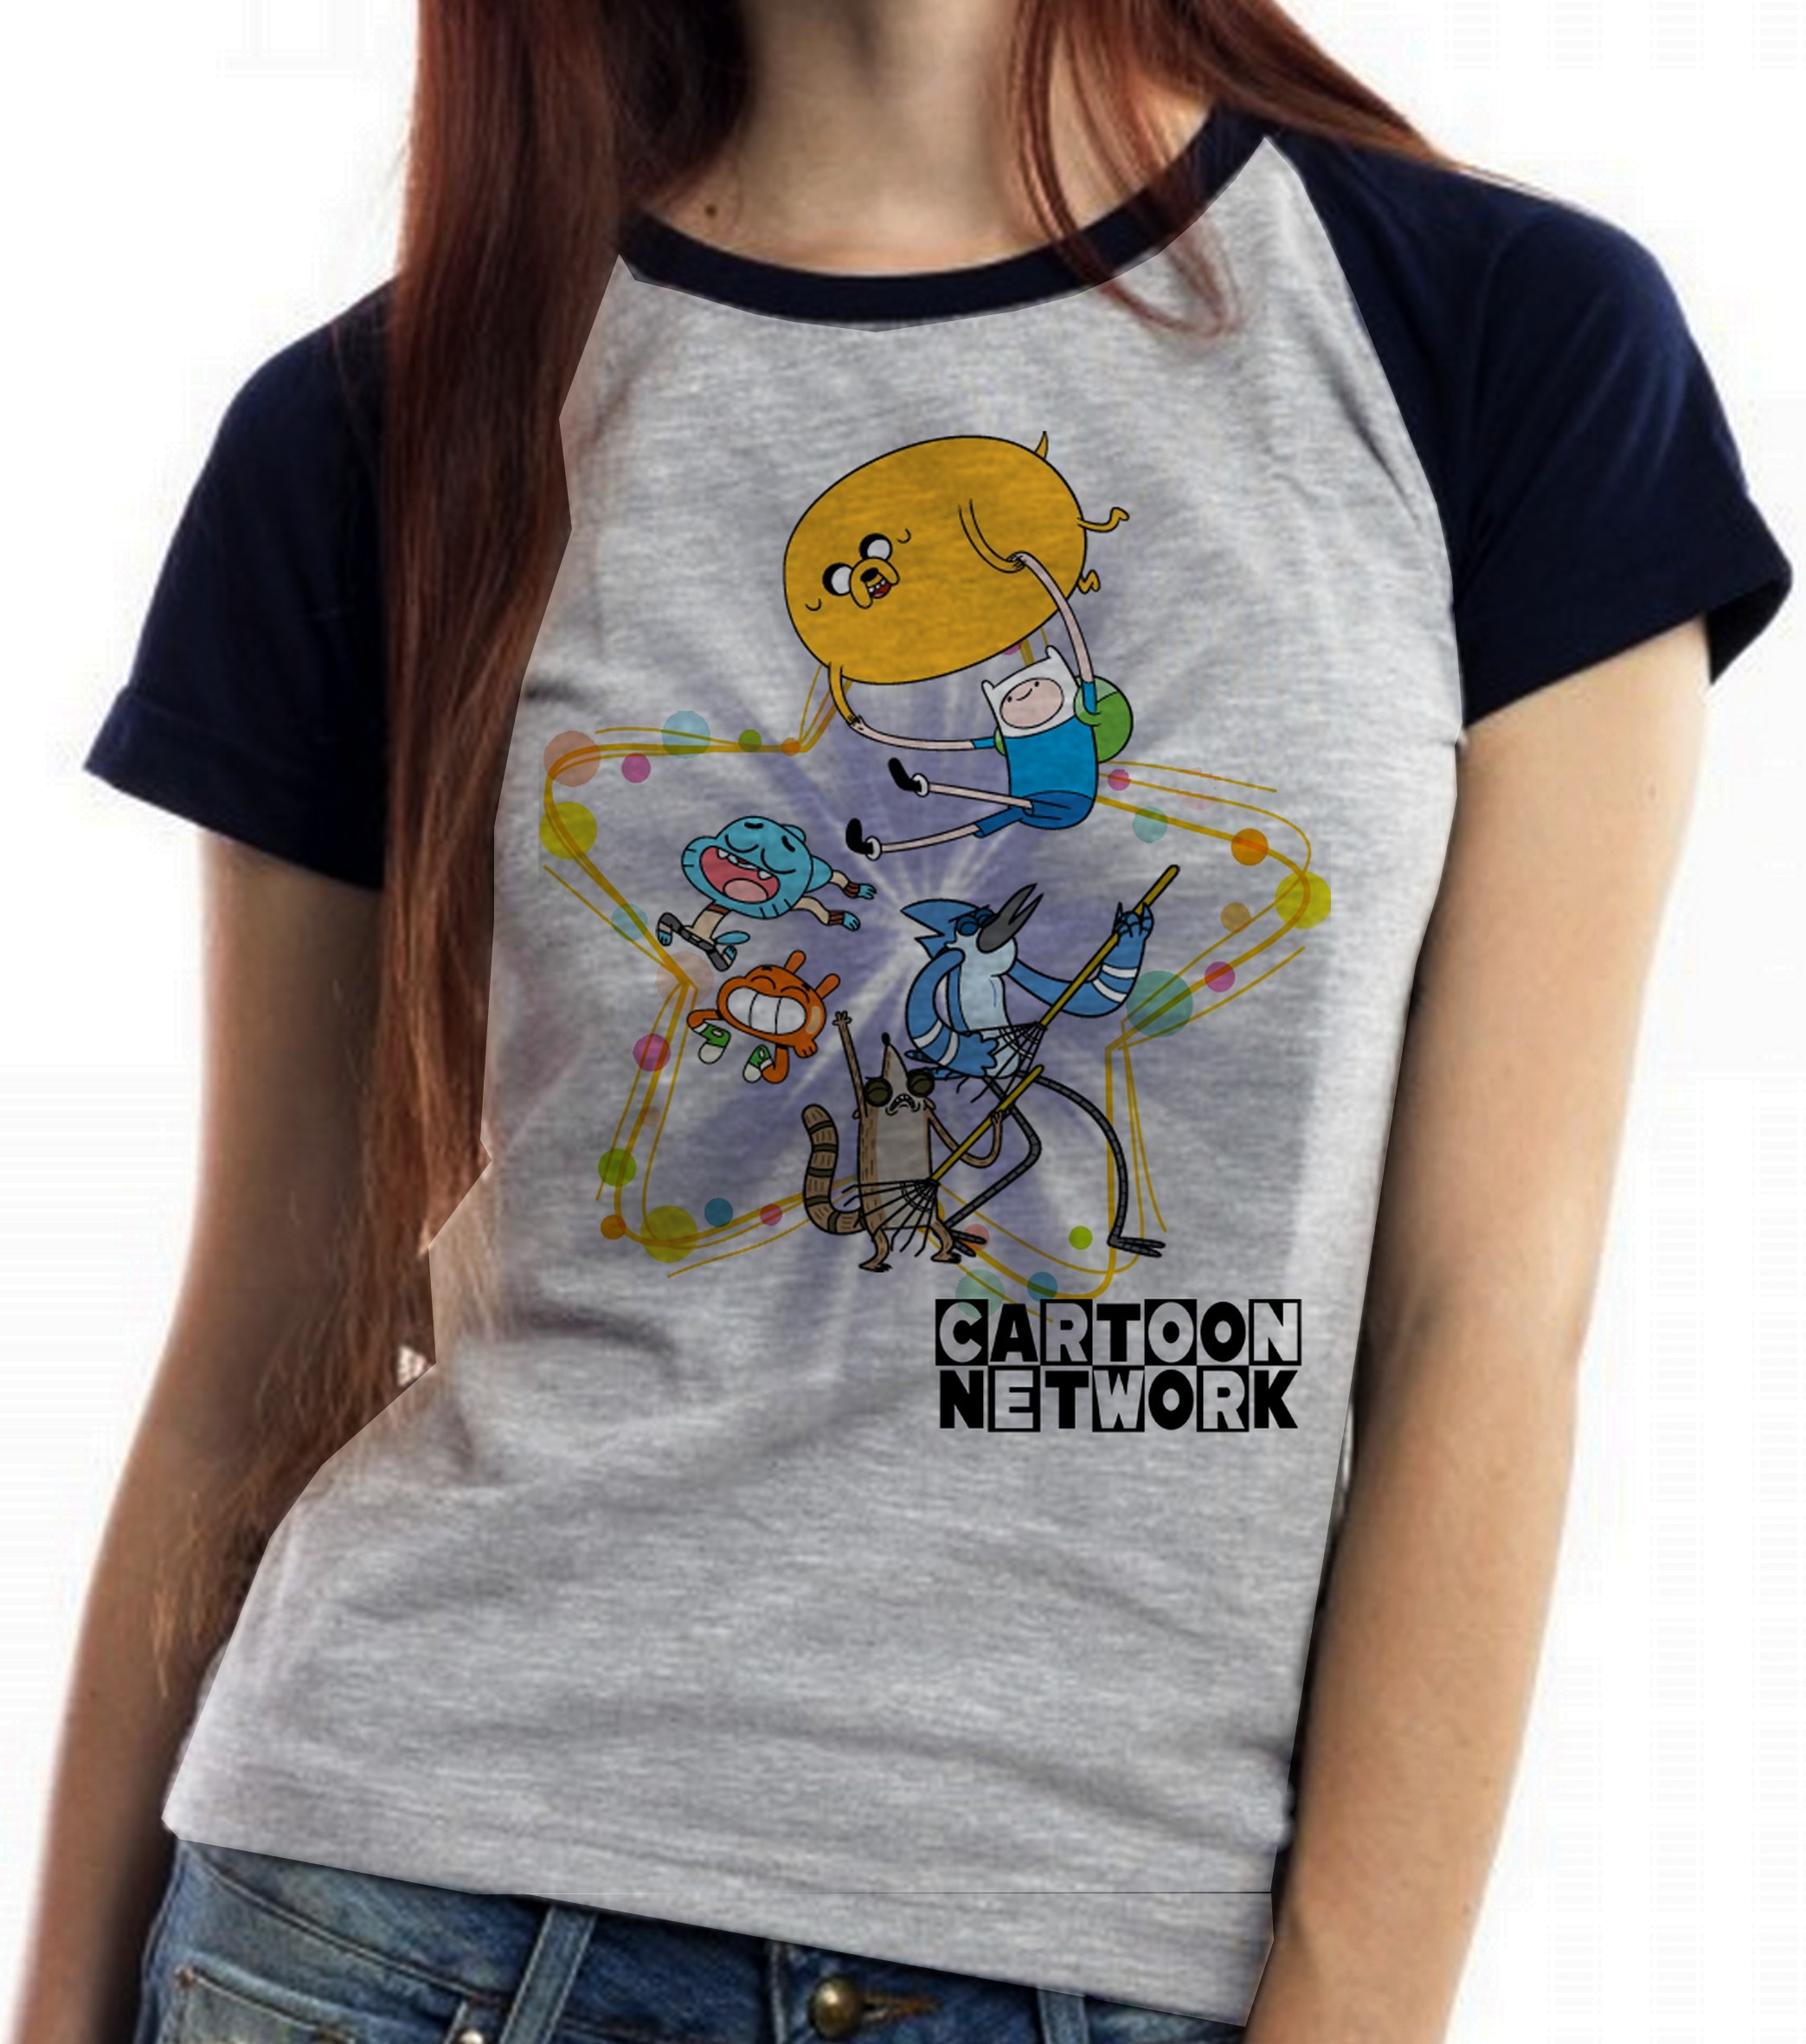 Blusa Feminina Baby Look Cartoon Network Personagens Desenho No